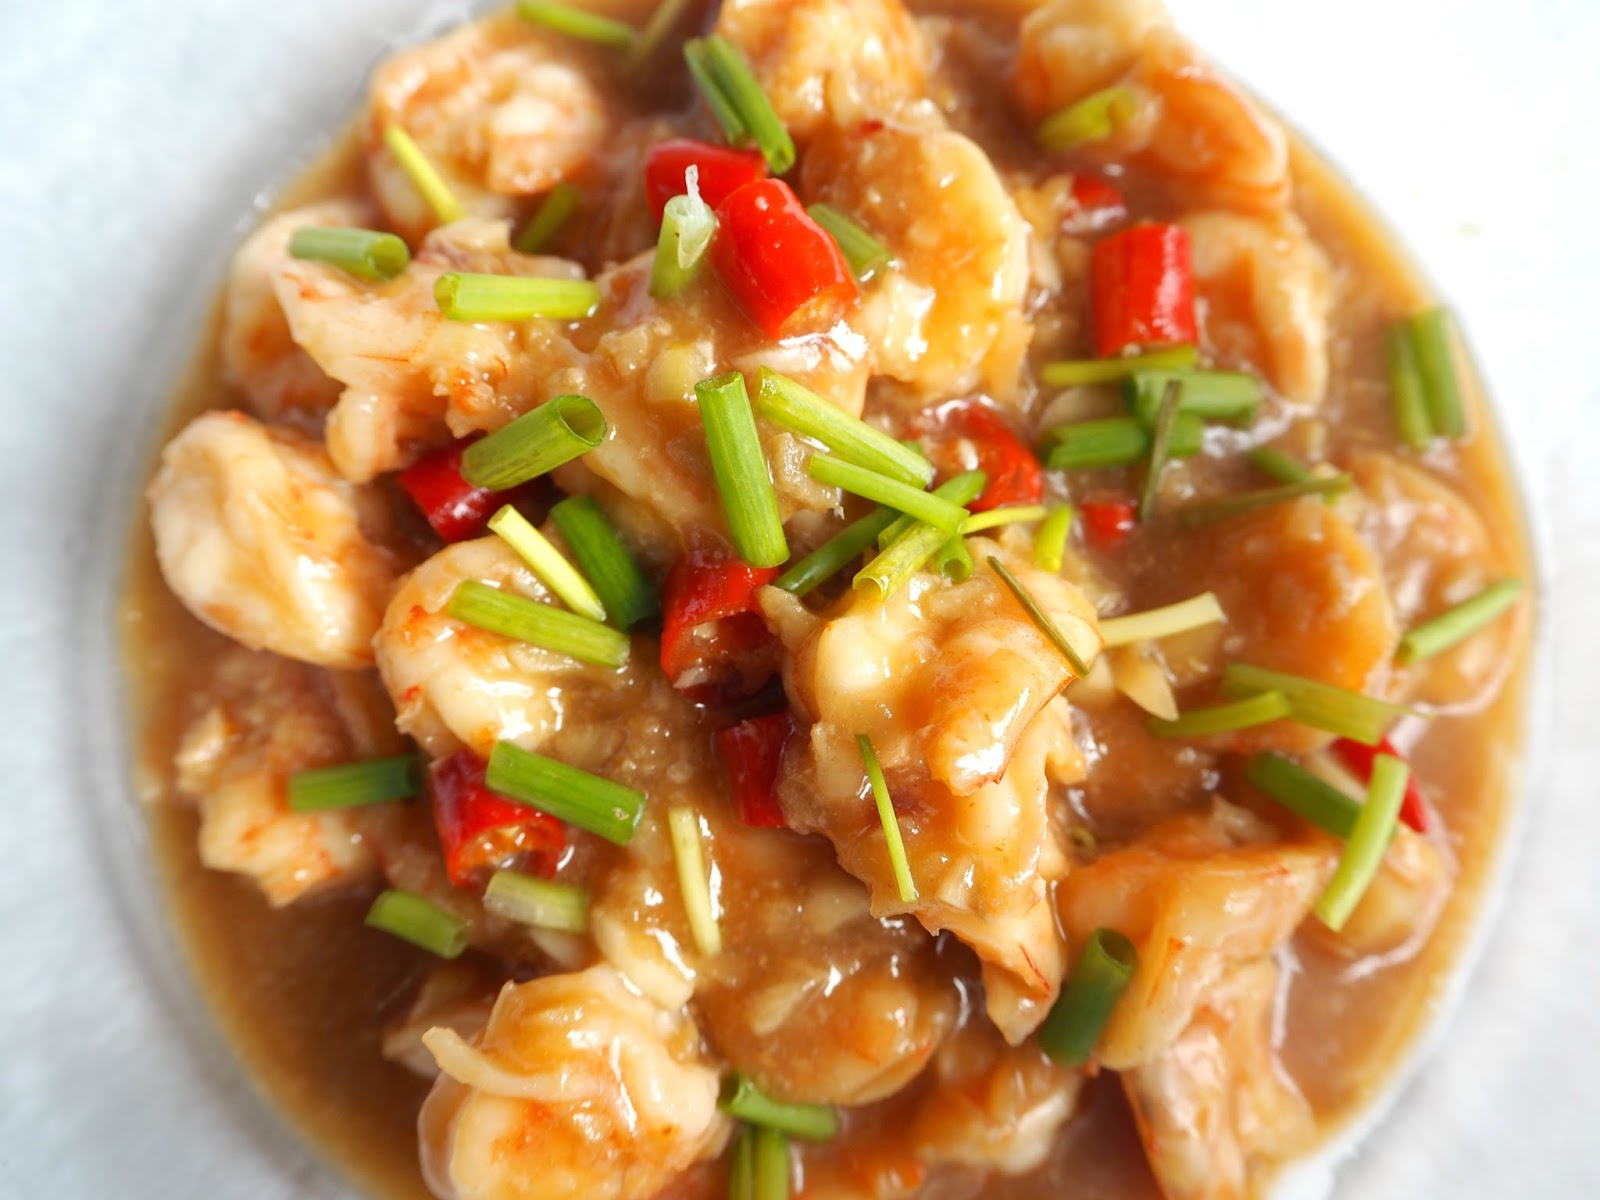 stir fry spicy shrimp